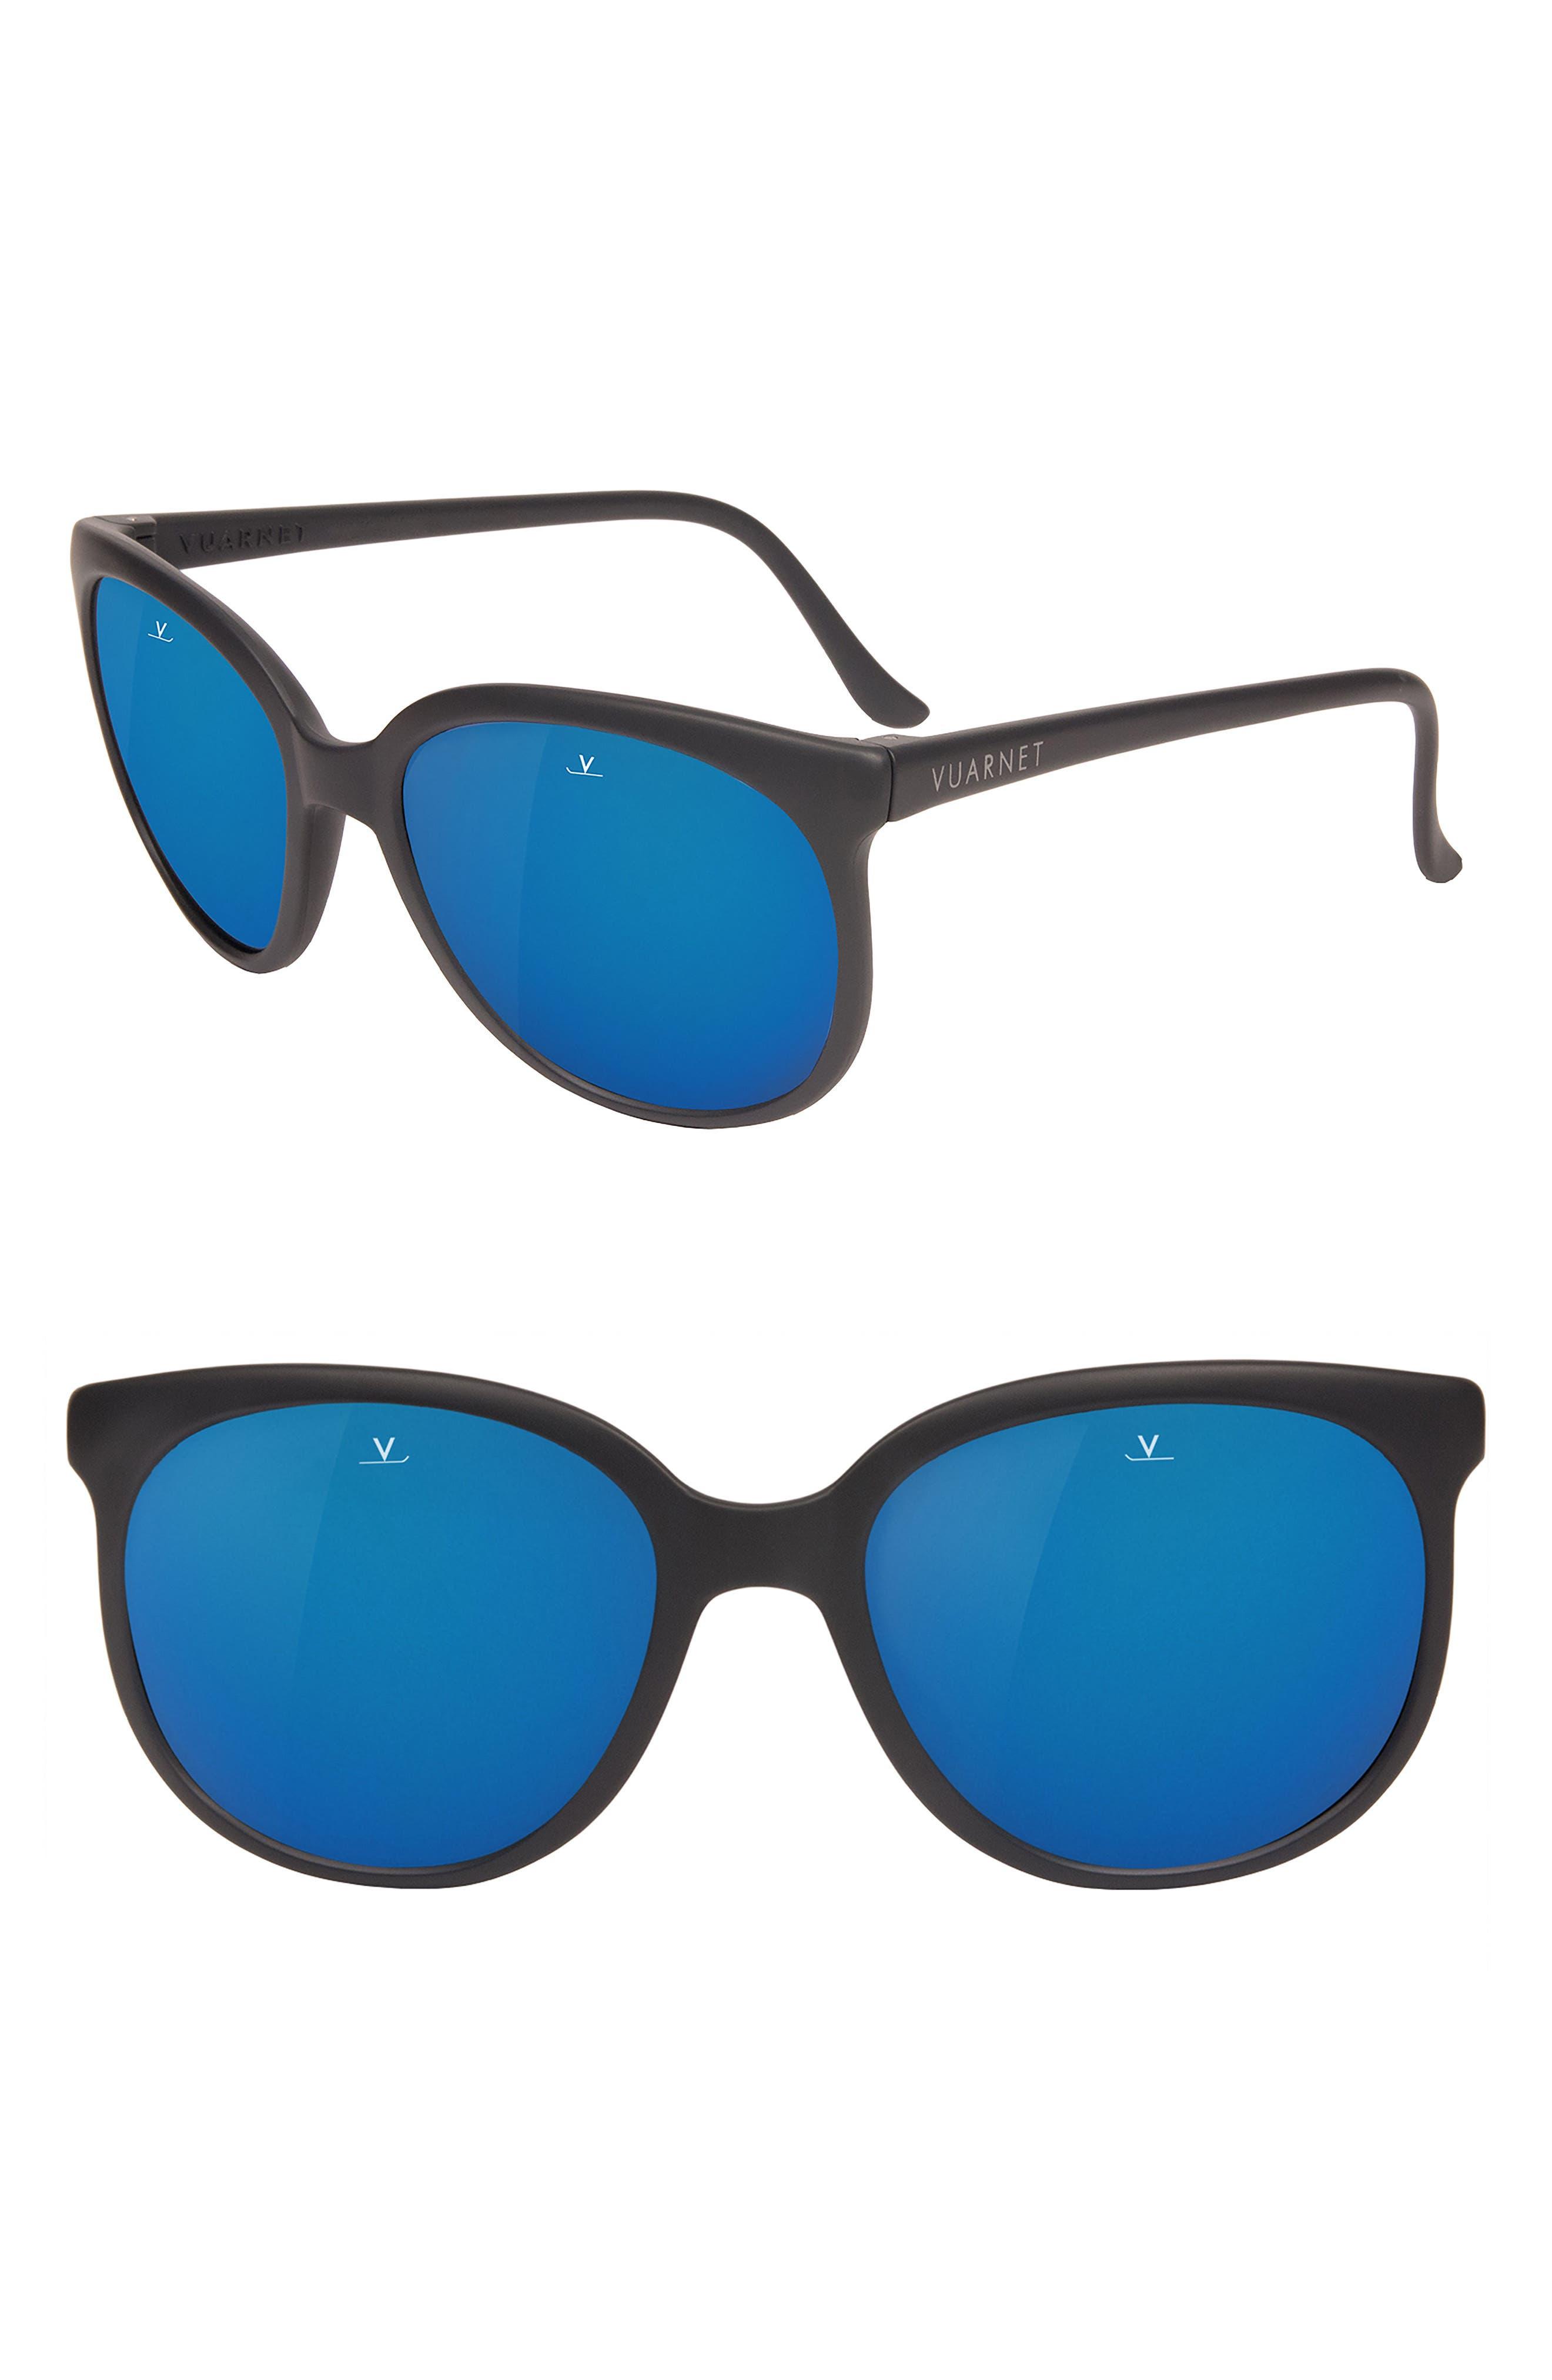 VUARNET LEGENDS 02 55MM POLARIZED SUNGLASSES - GREY POLAR BLUE FLASH